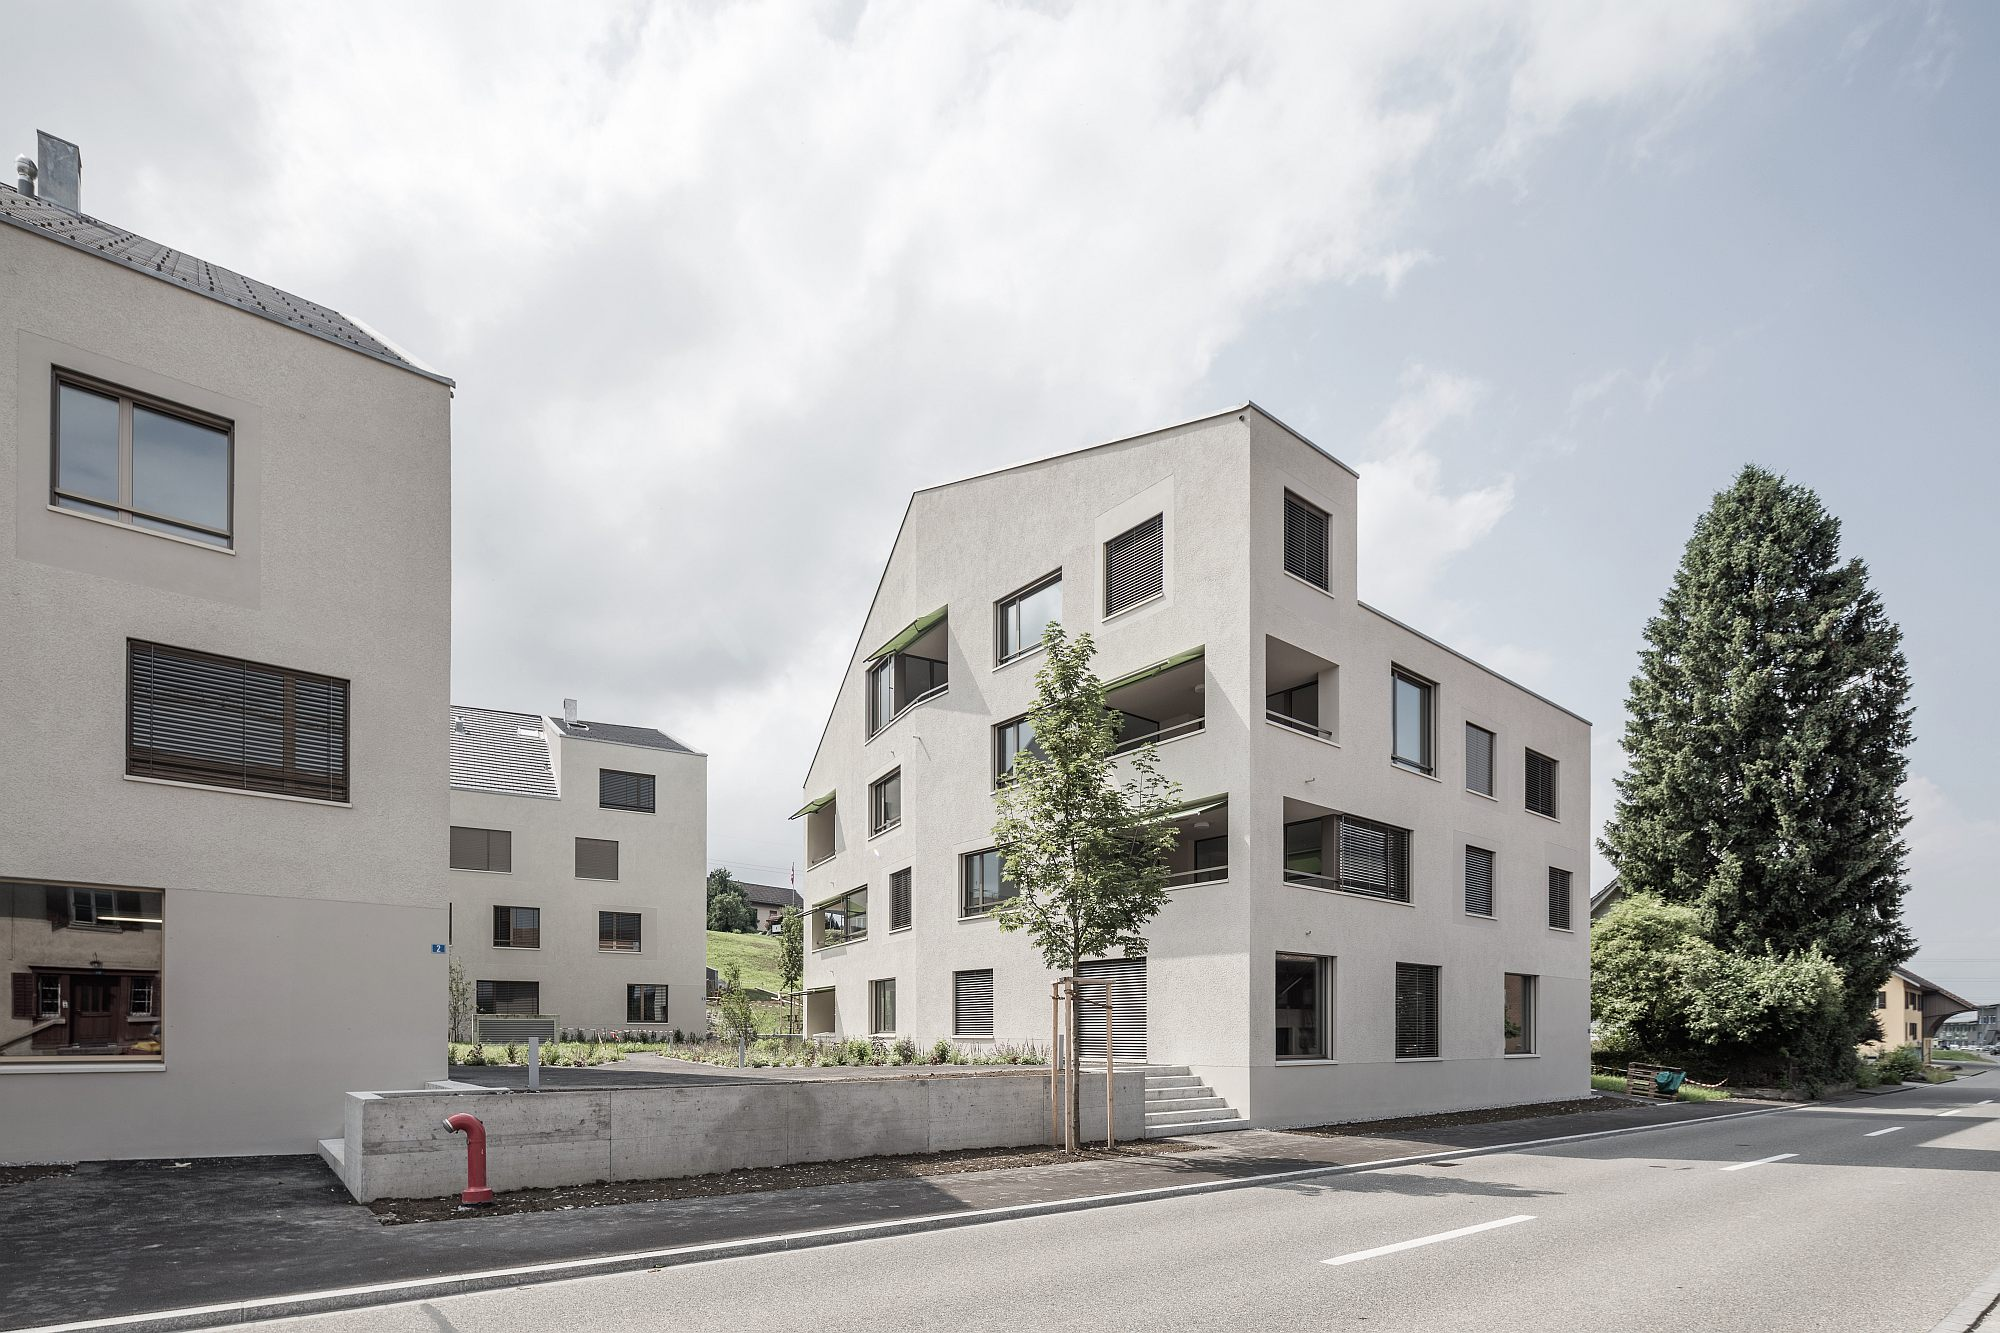 Igual_ Guggenheim_ locuinte sociale, Mühlau Schmittenplatz -2